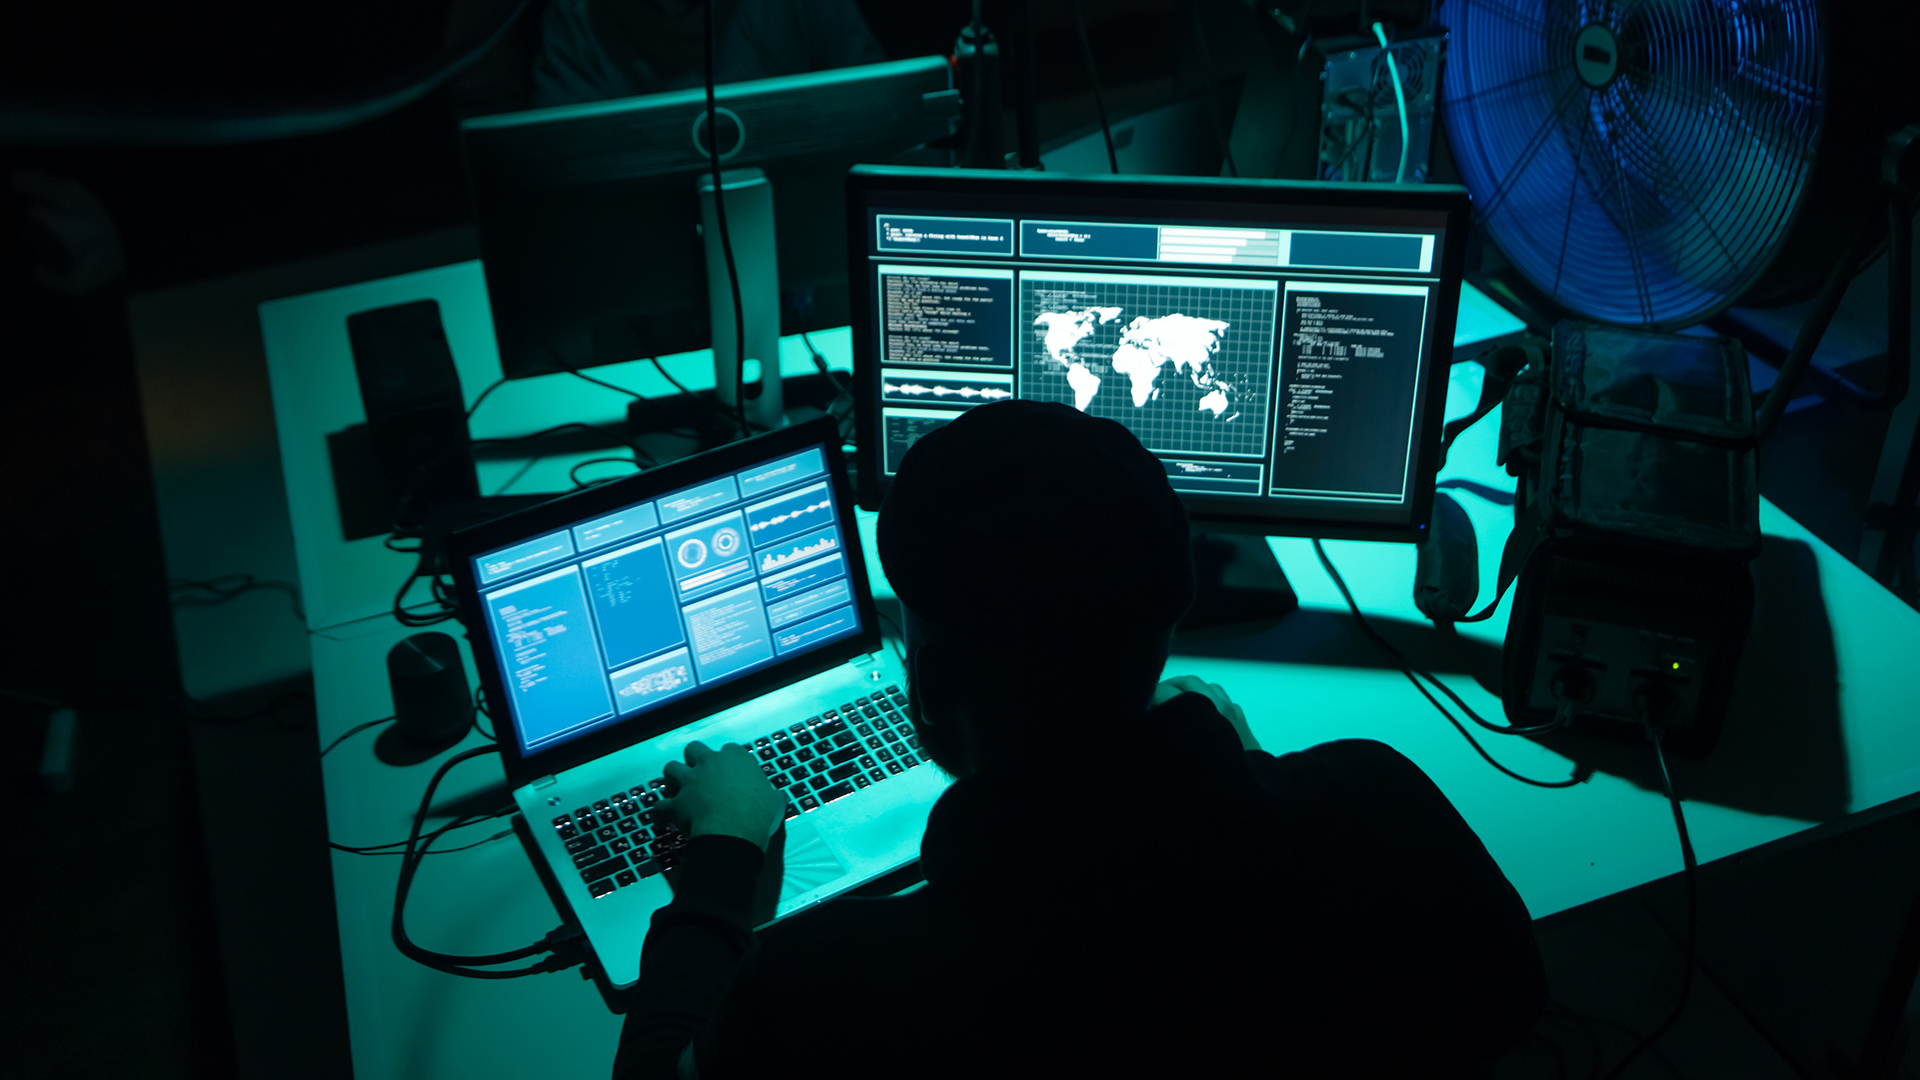 4 técnicas para no caer en las garras de un ataque cibernético